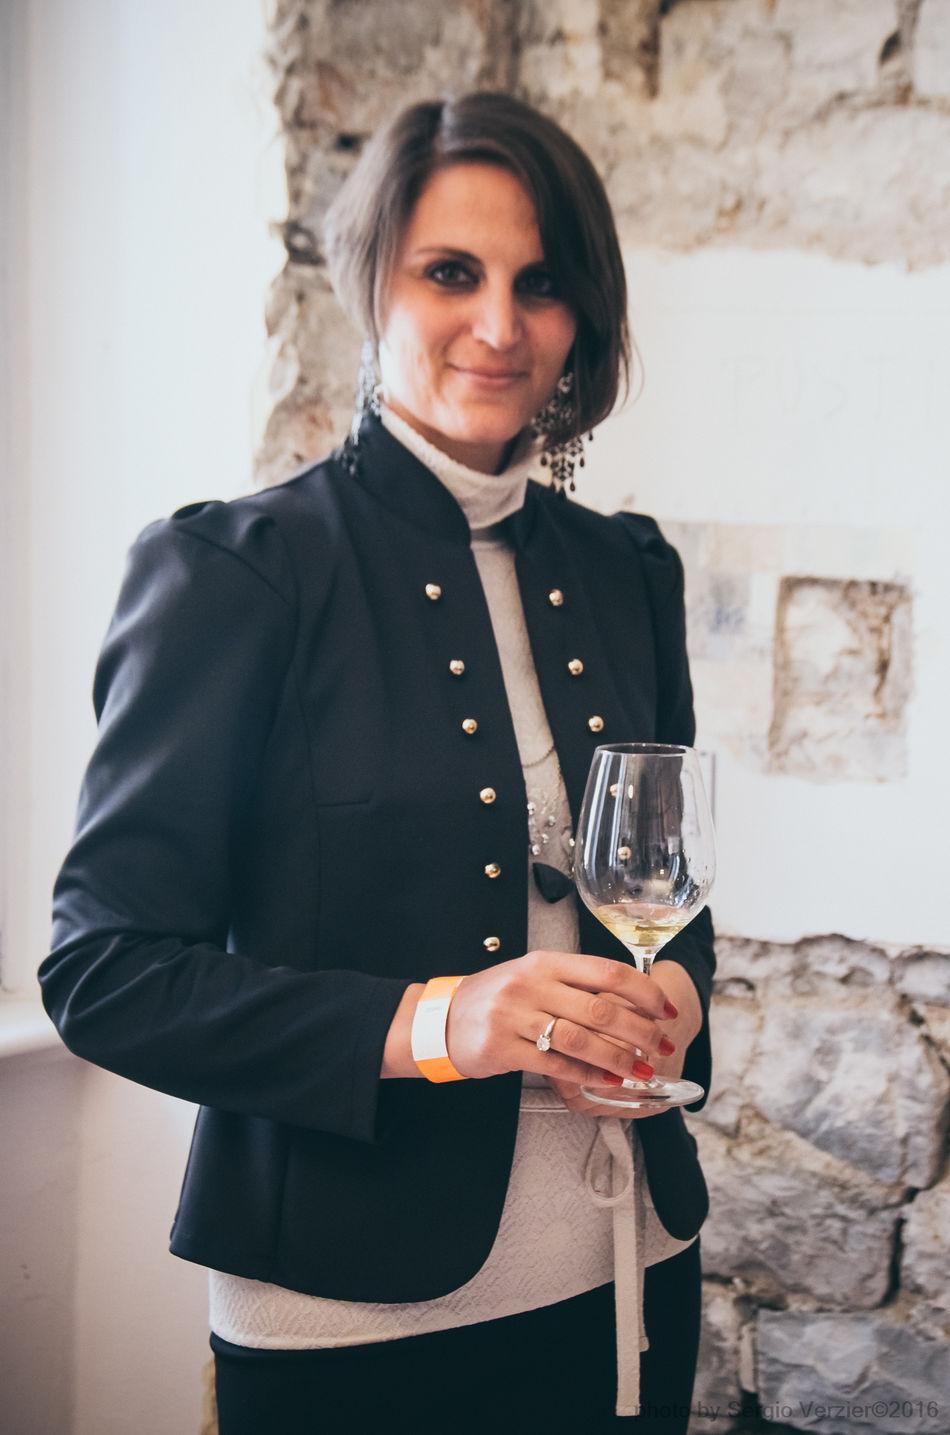 2016 FeelSlovenia Izola- Slovenia Orange Wine Orangewinefestival Pentax K5ll Peopleatwork Portrait Wineandmore